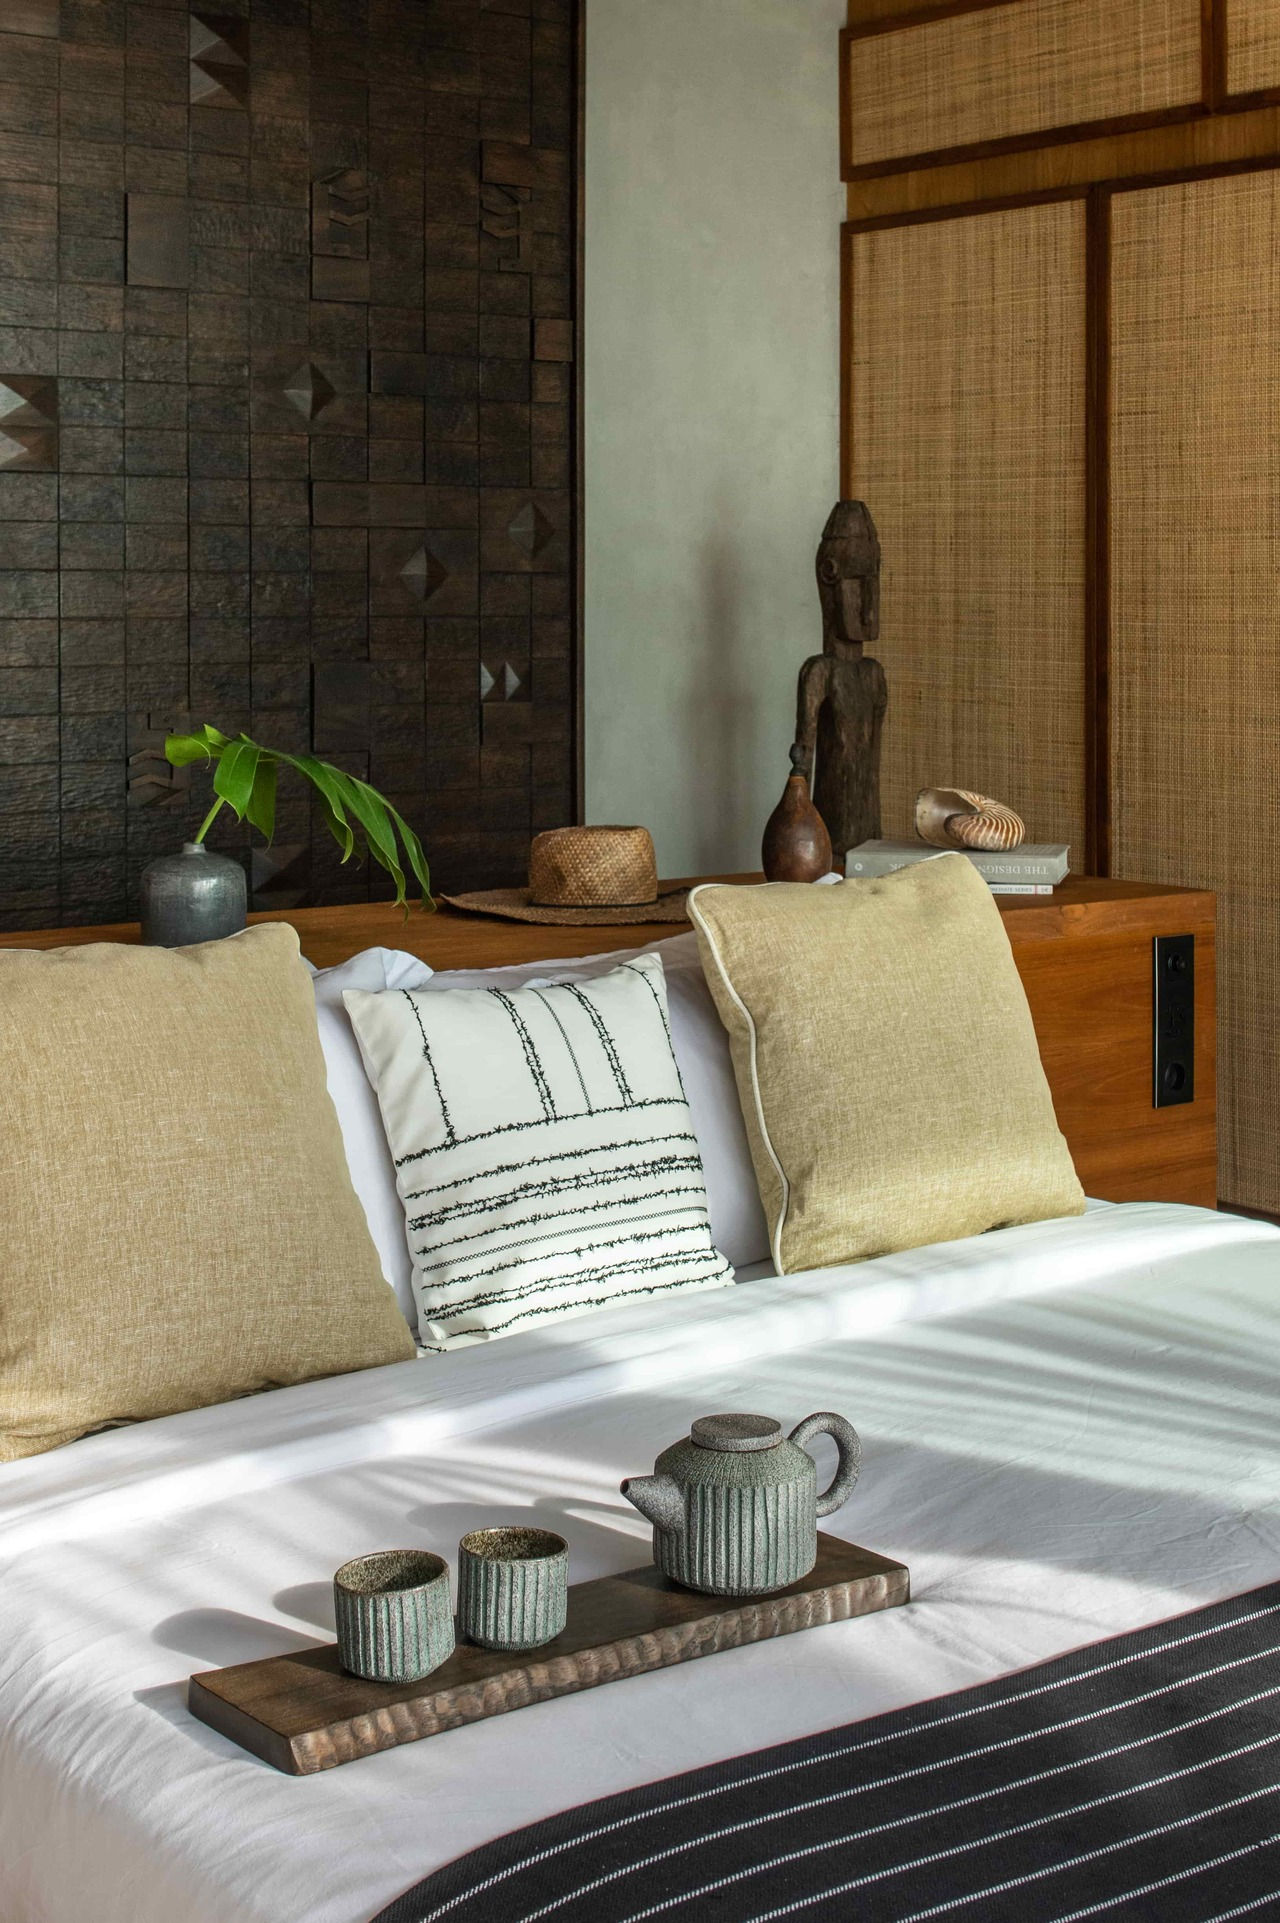 CapKaroso-VillaN'dara-bed-teaset-carvedwoodboard